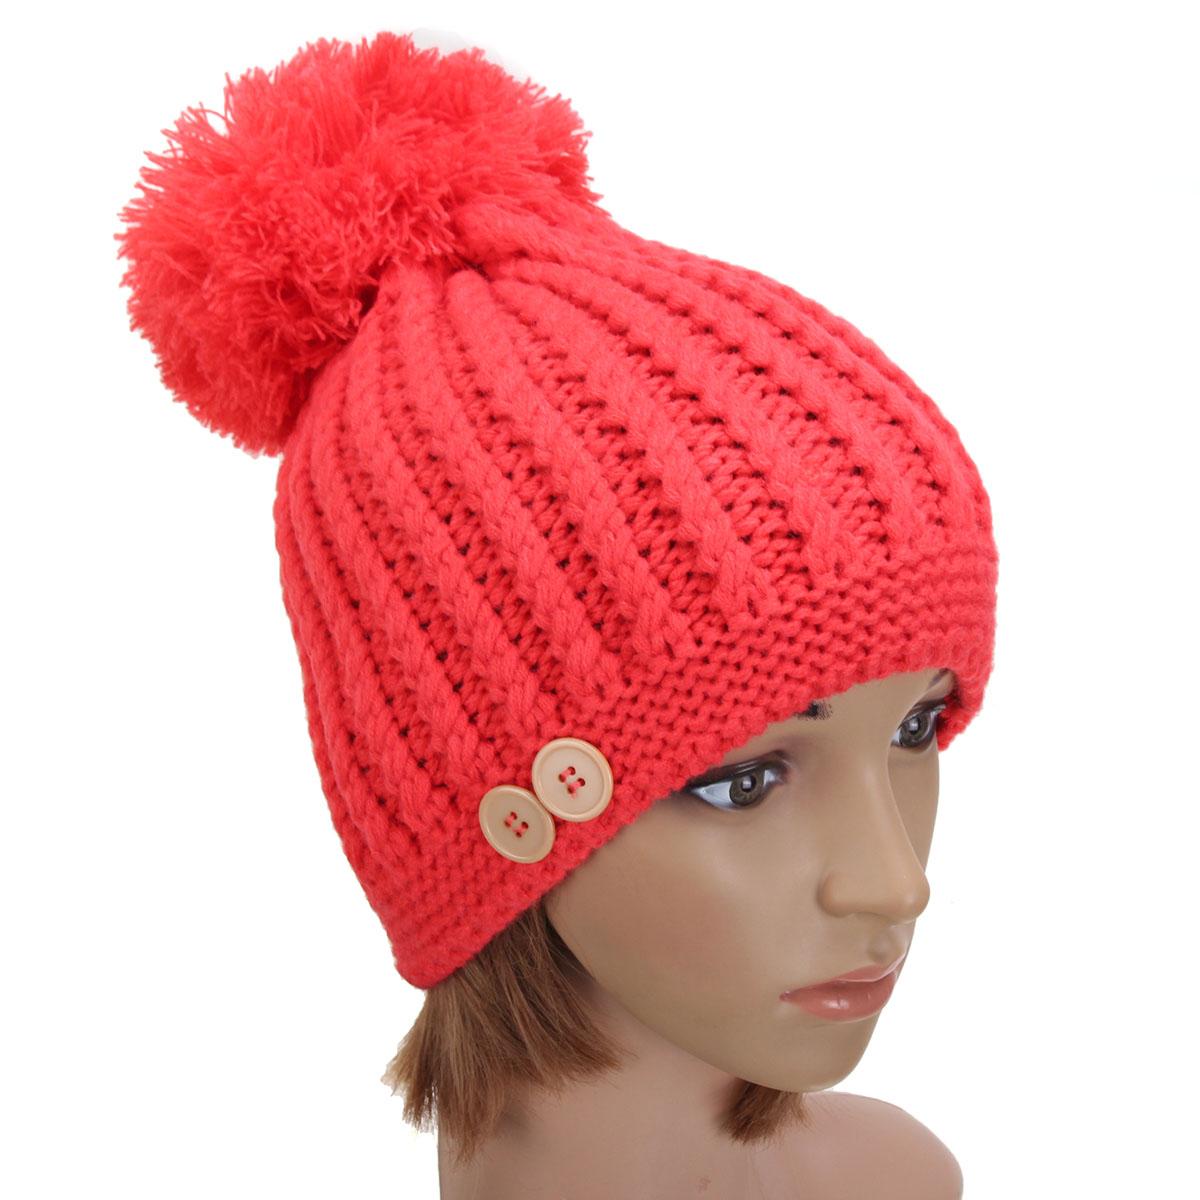 ea8b5d10c37 Women Ladies Button Crochet Knitted Beret Hat Ski Beanie Ball Wool Winter  Warm Cap - Thumbnail ...